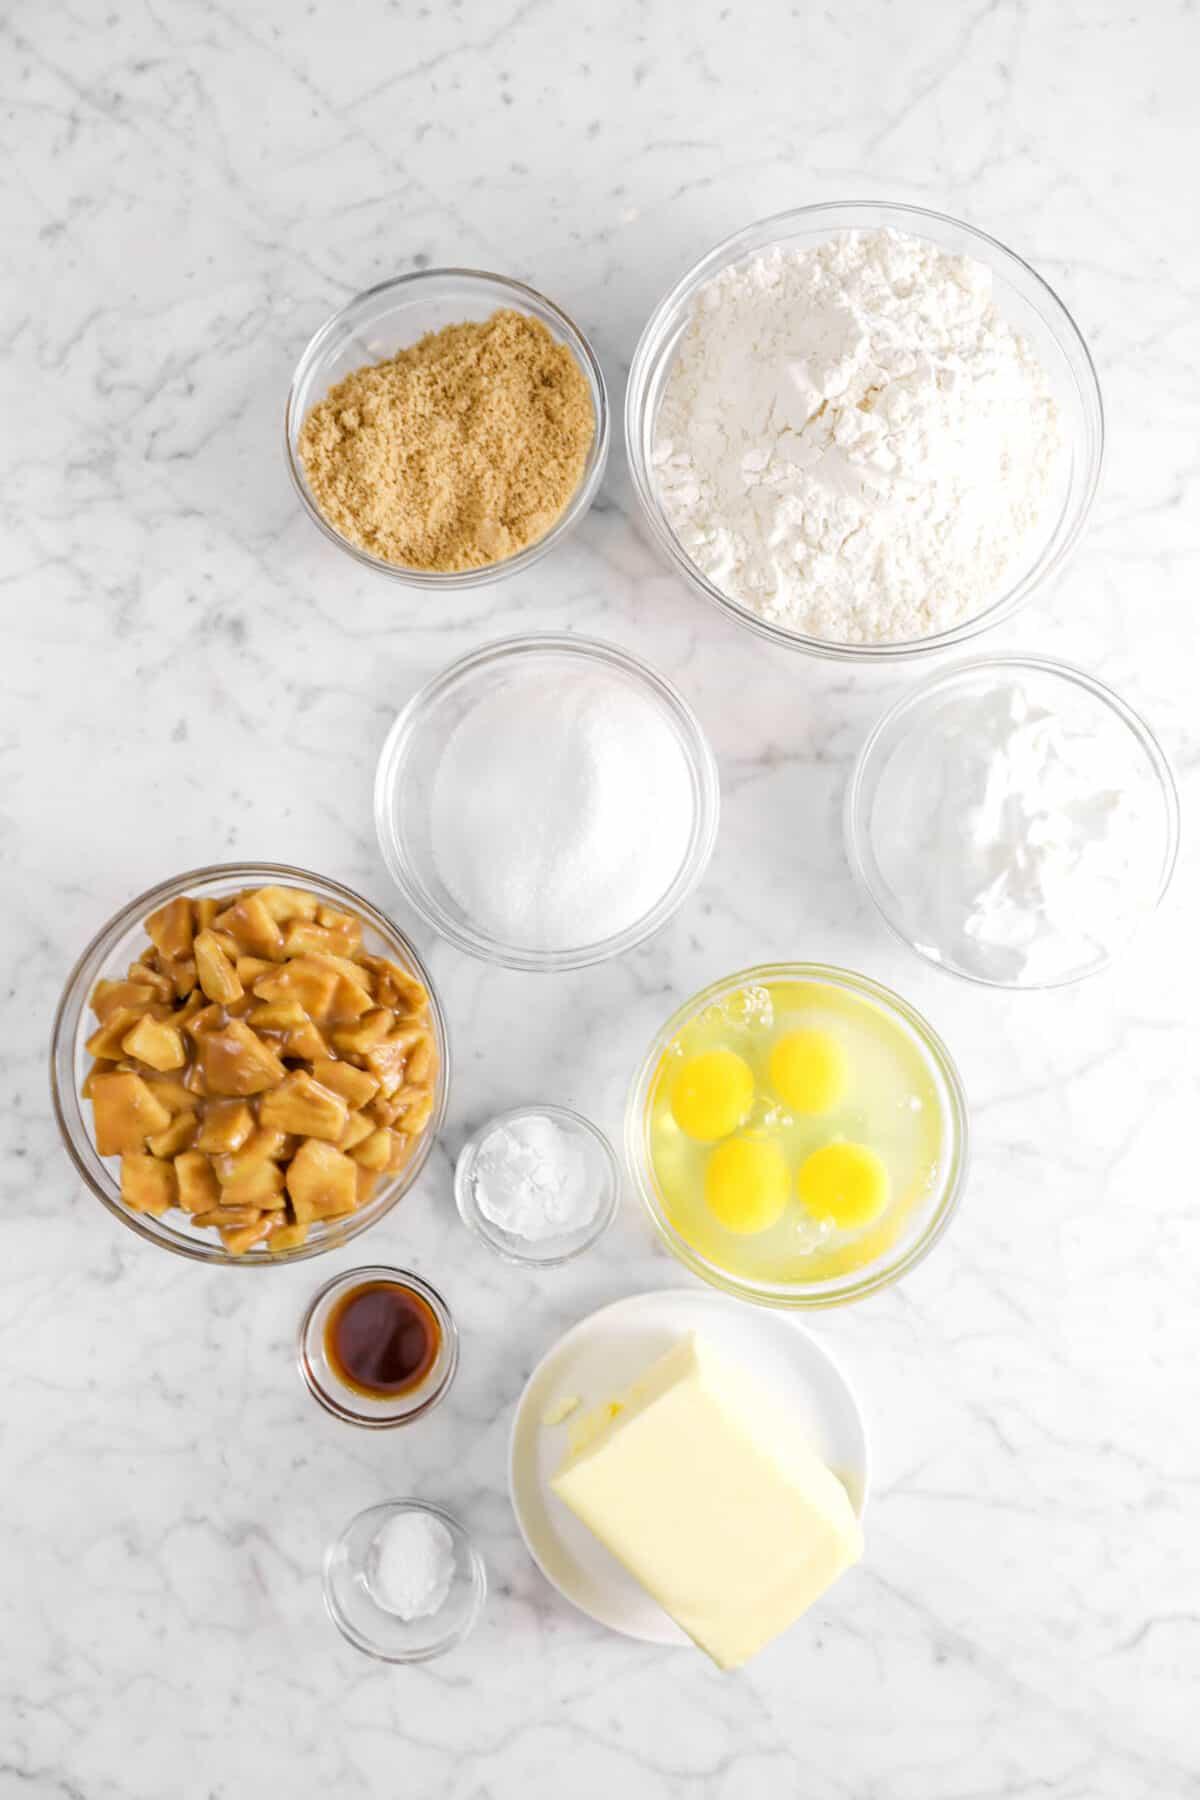 brown sugar, flour, sugar, sour cream, apple pie filling, eggs, baking powder, vanilla, butter, and baking soda in glass bowls